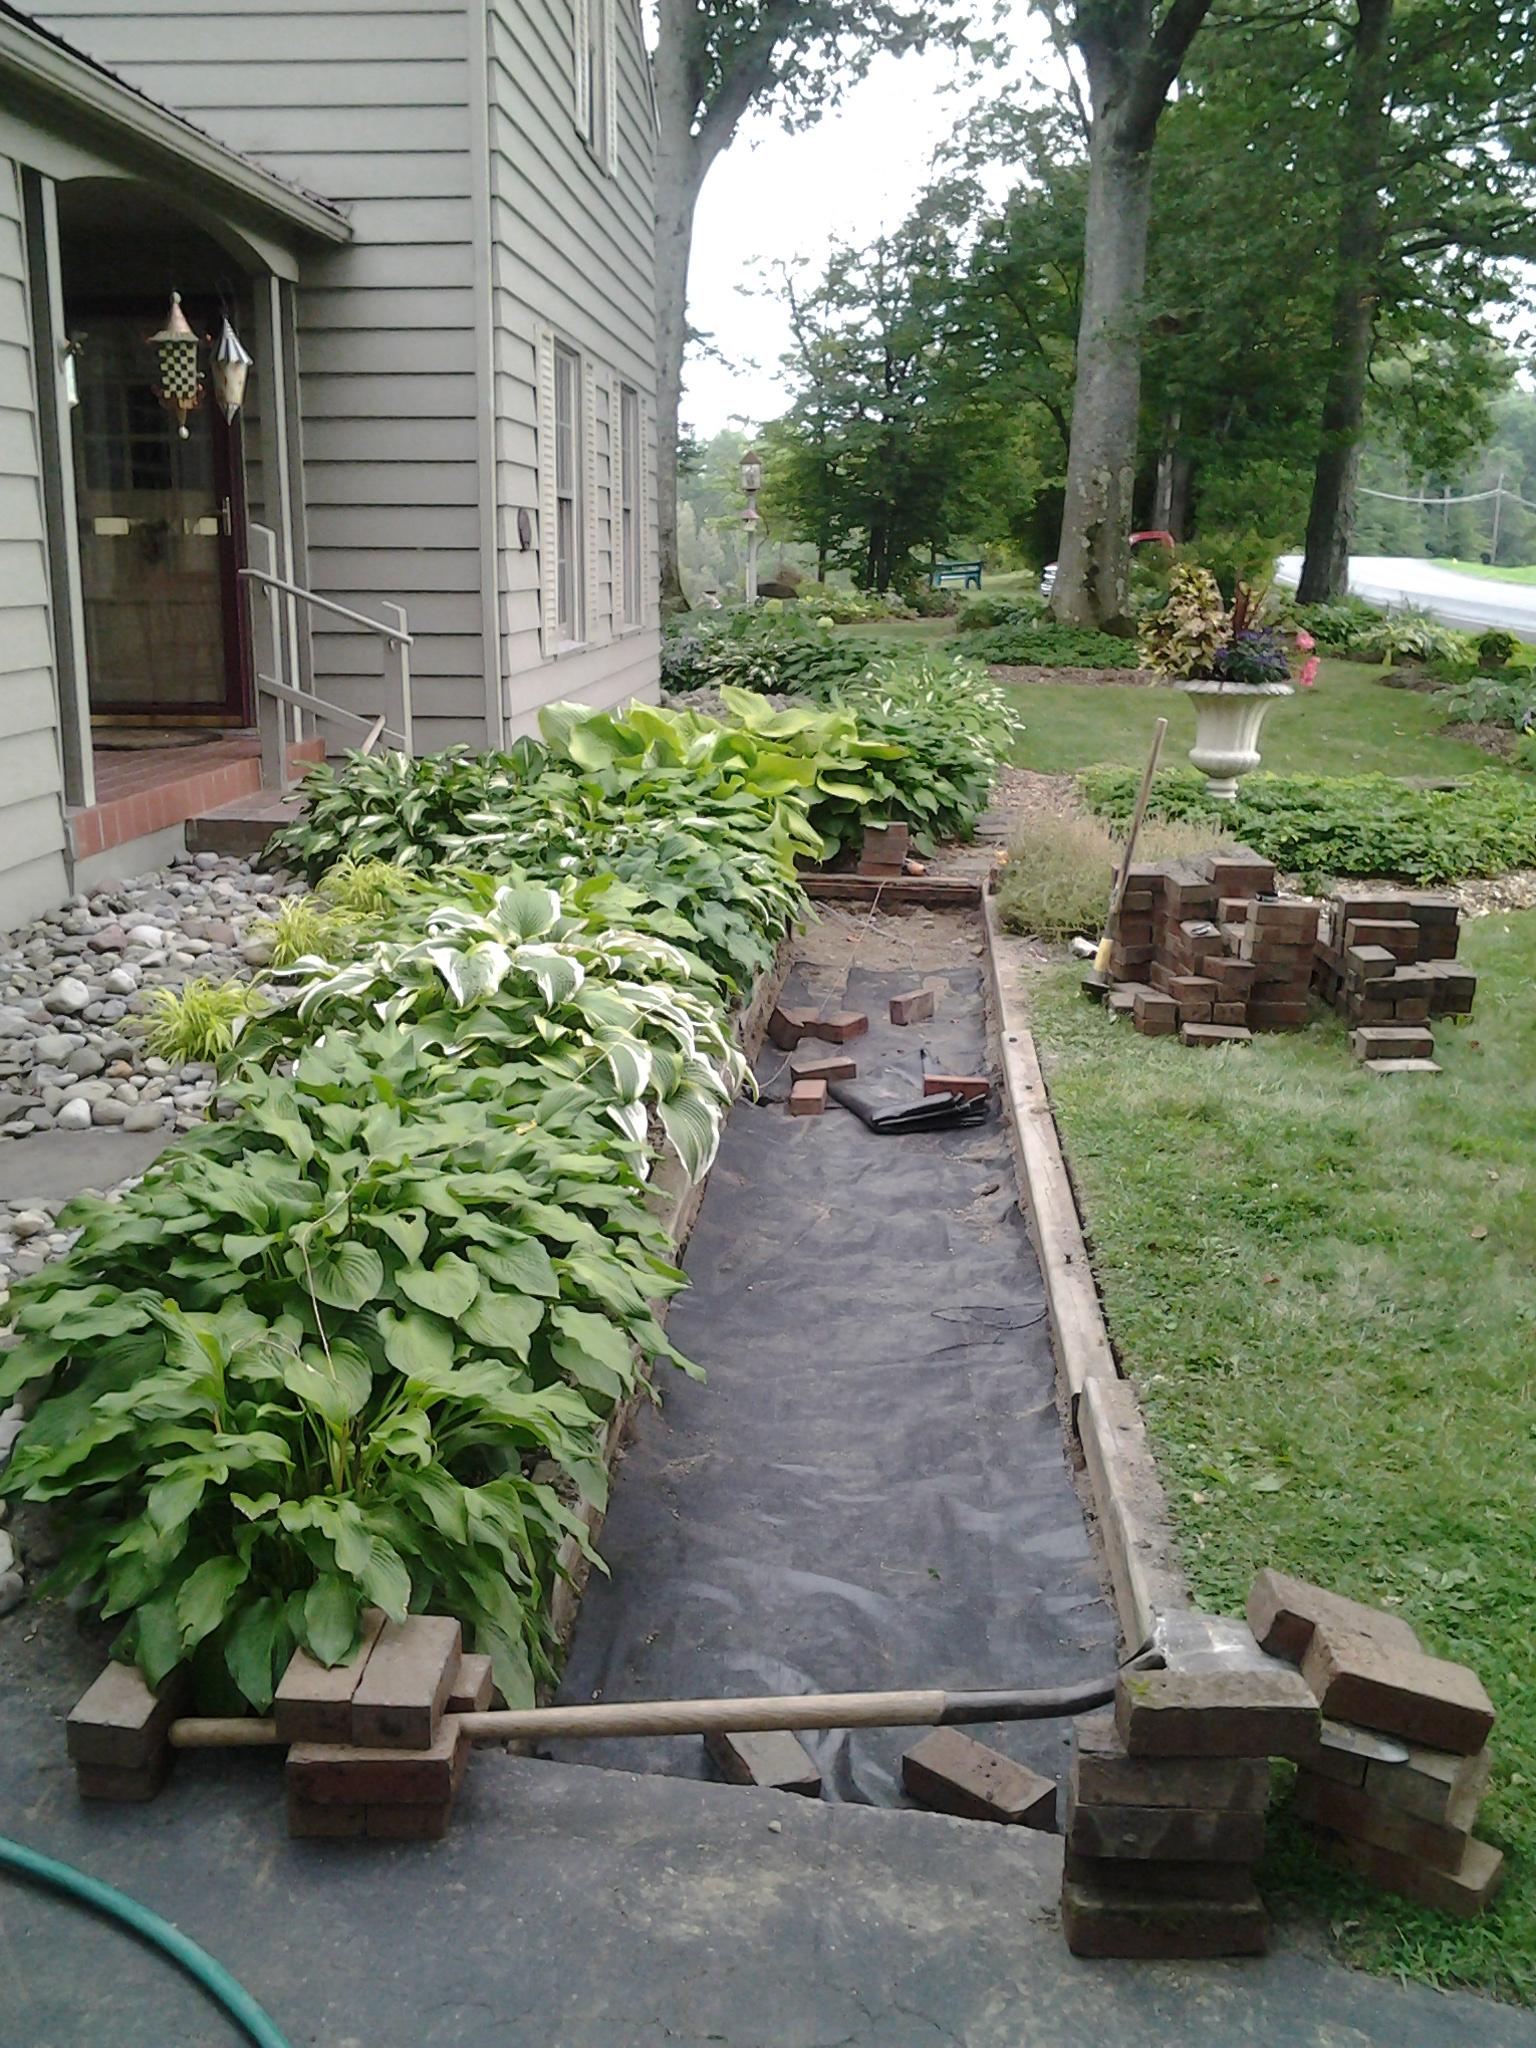 Grassmasters Landscaping Work in Progress